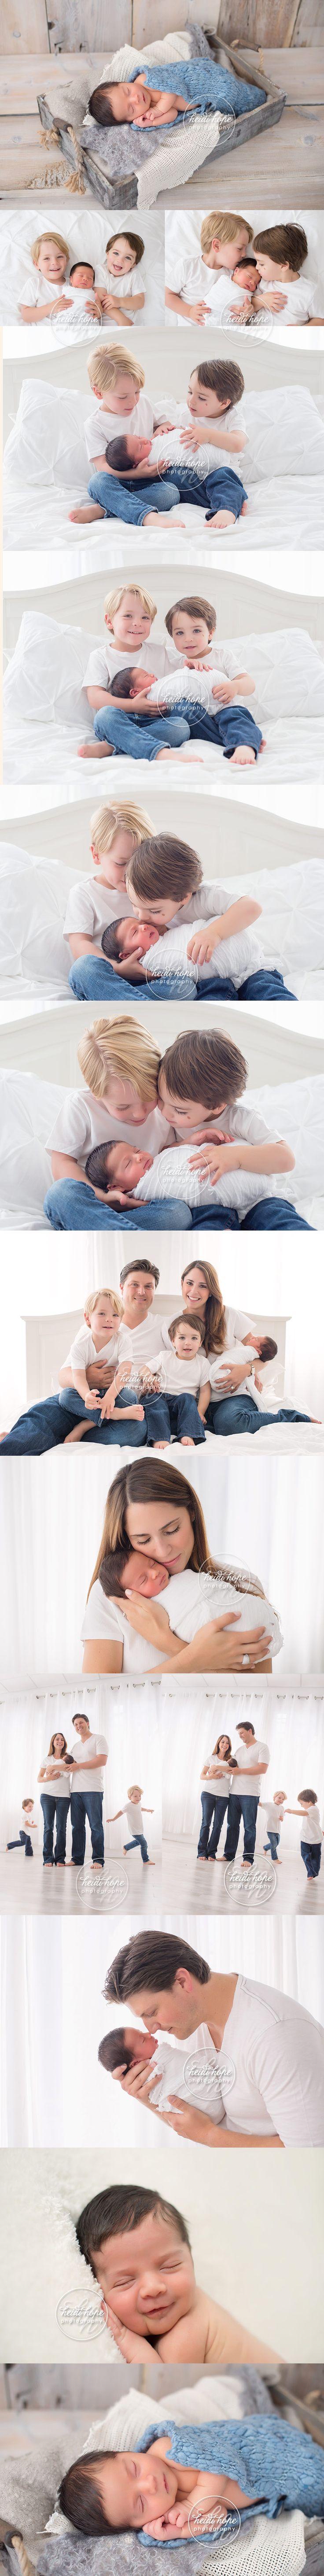 newborn-baby-boy-with-2-older-brothers